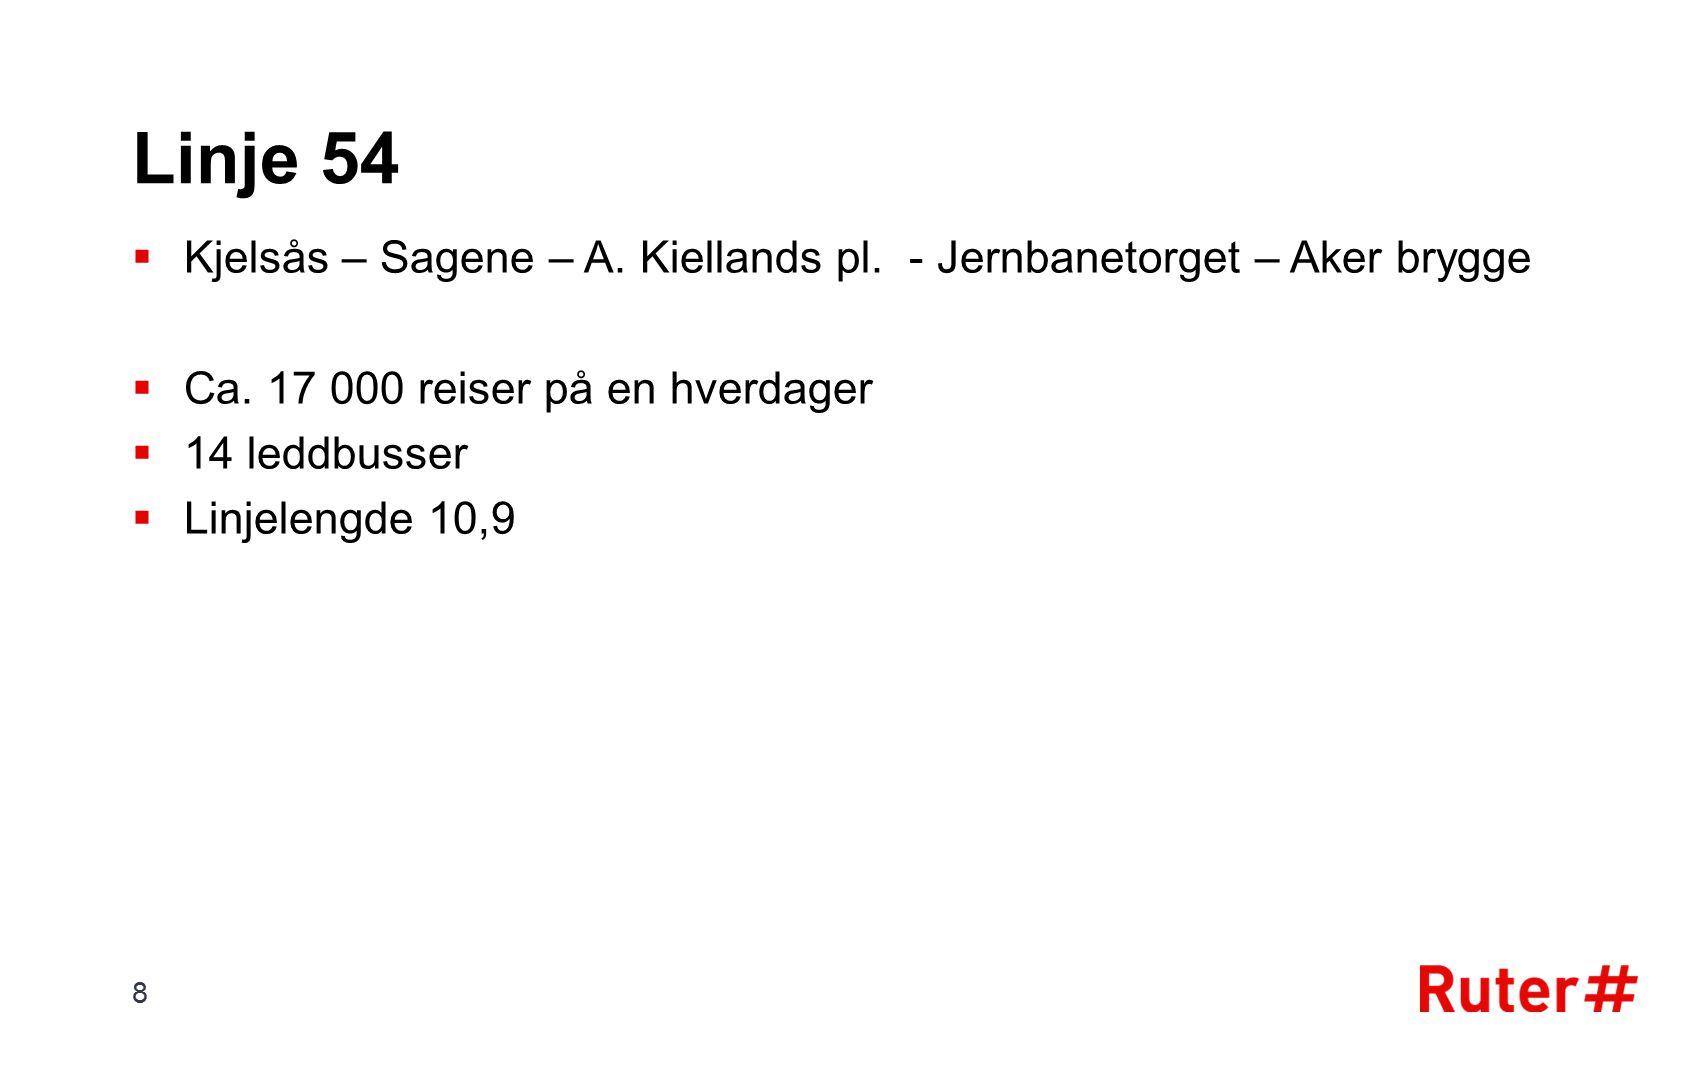 Linje 54  Kjelsås – Sagene – A. Kiellands pl. - Jernbanetorget – Aker brygge  Ca. 17 000 reiser på en hverdager  14 leddbusser  Linjelengde 10,9 8